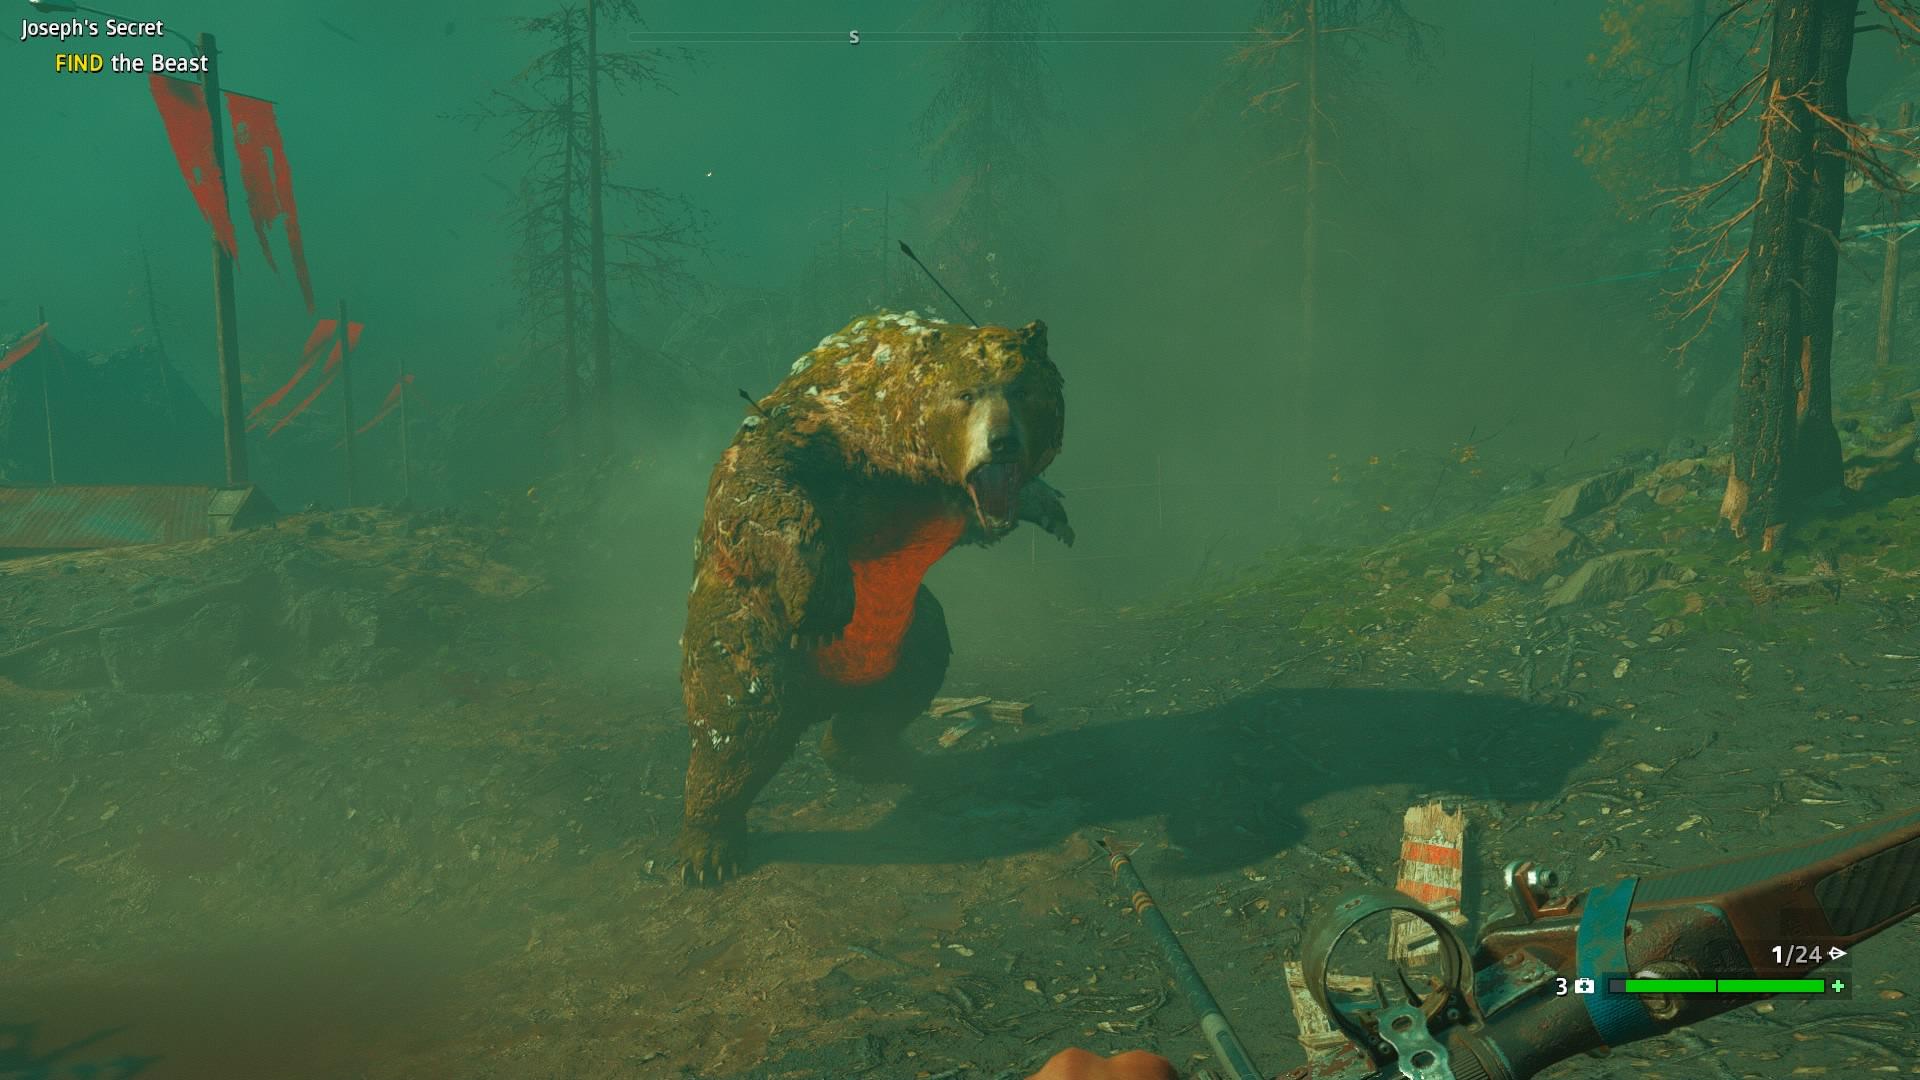 Far Cry New Dawn Joseph S Secret Walkthrough And Guide